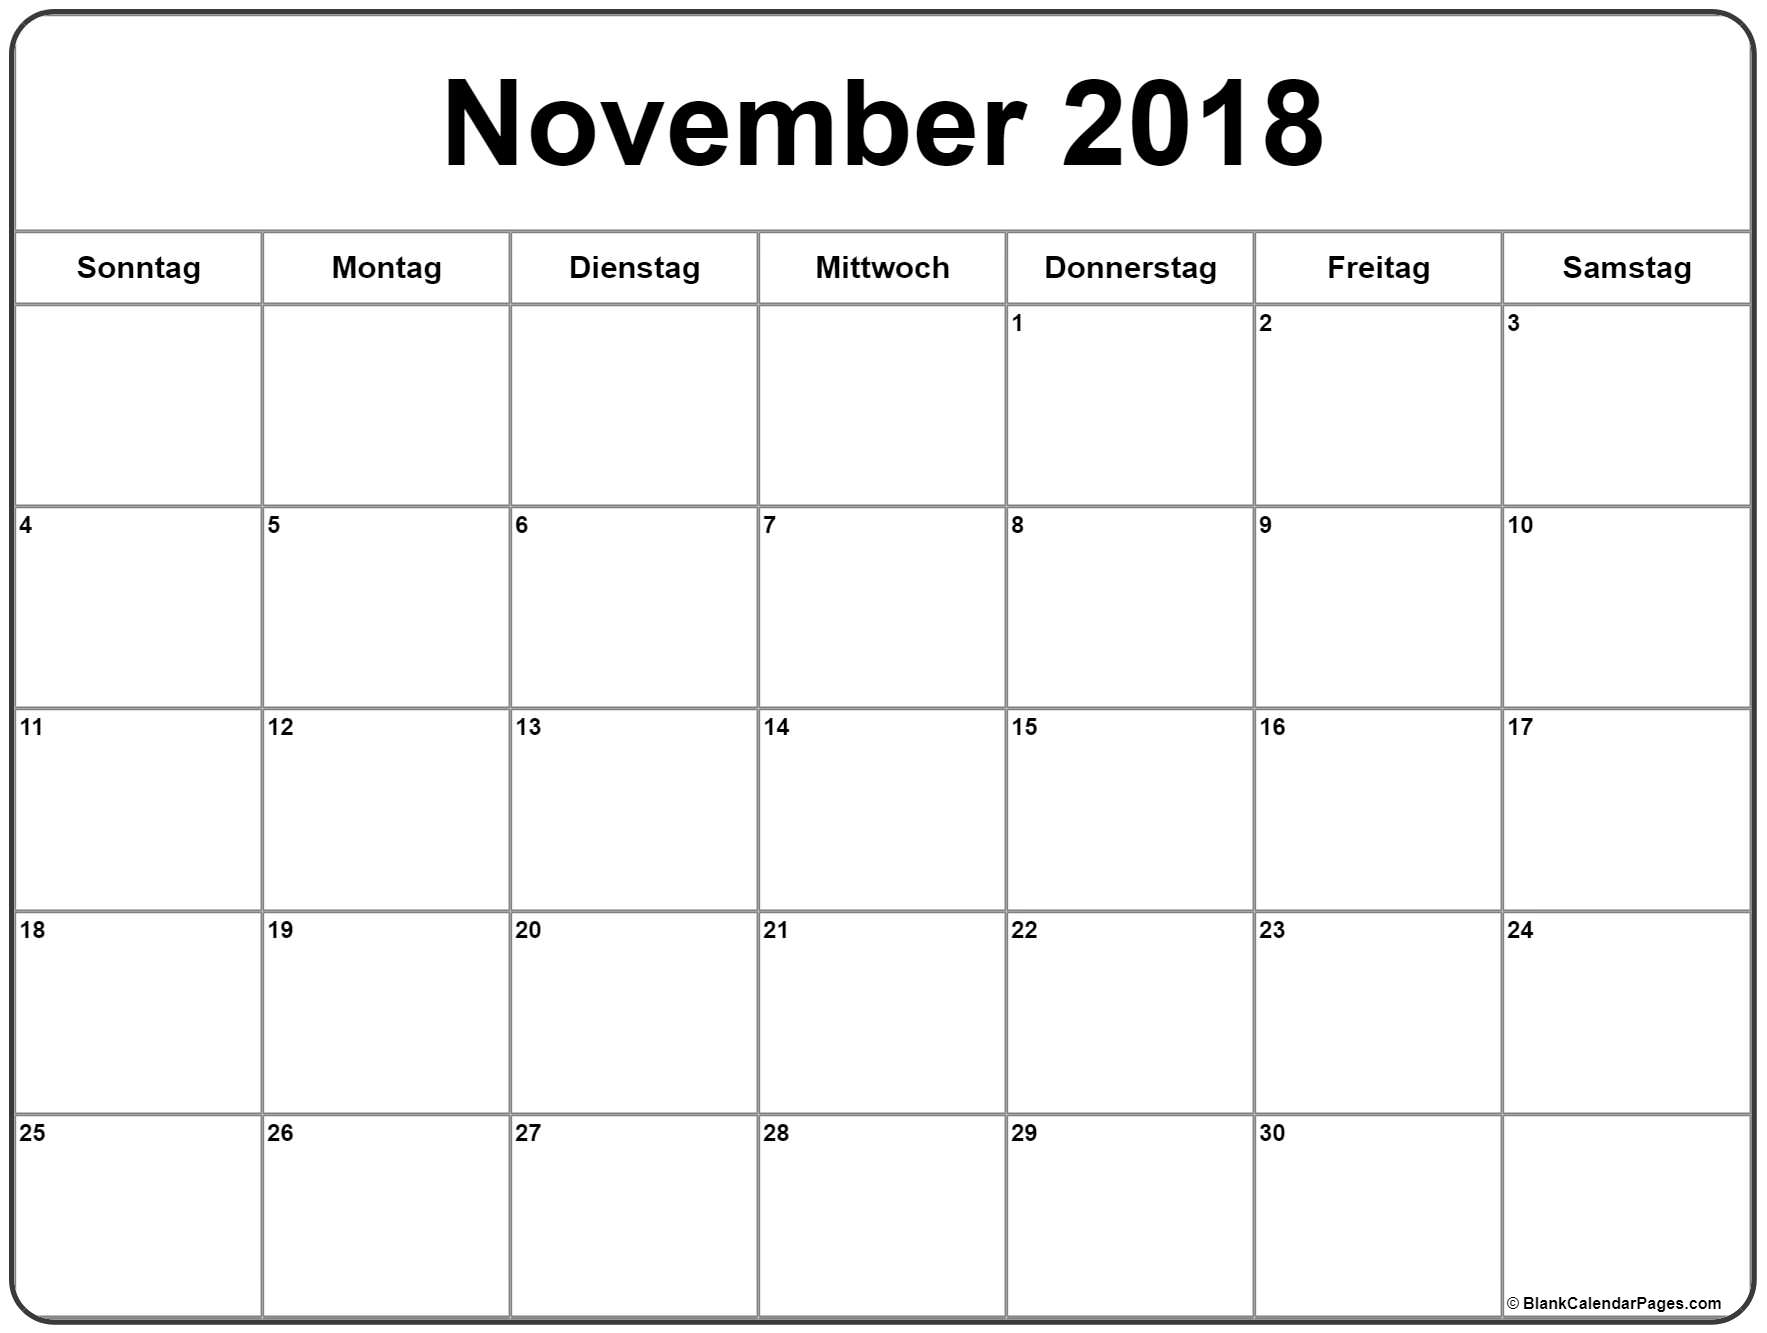 November kalendar 2018